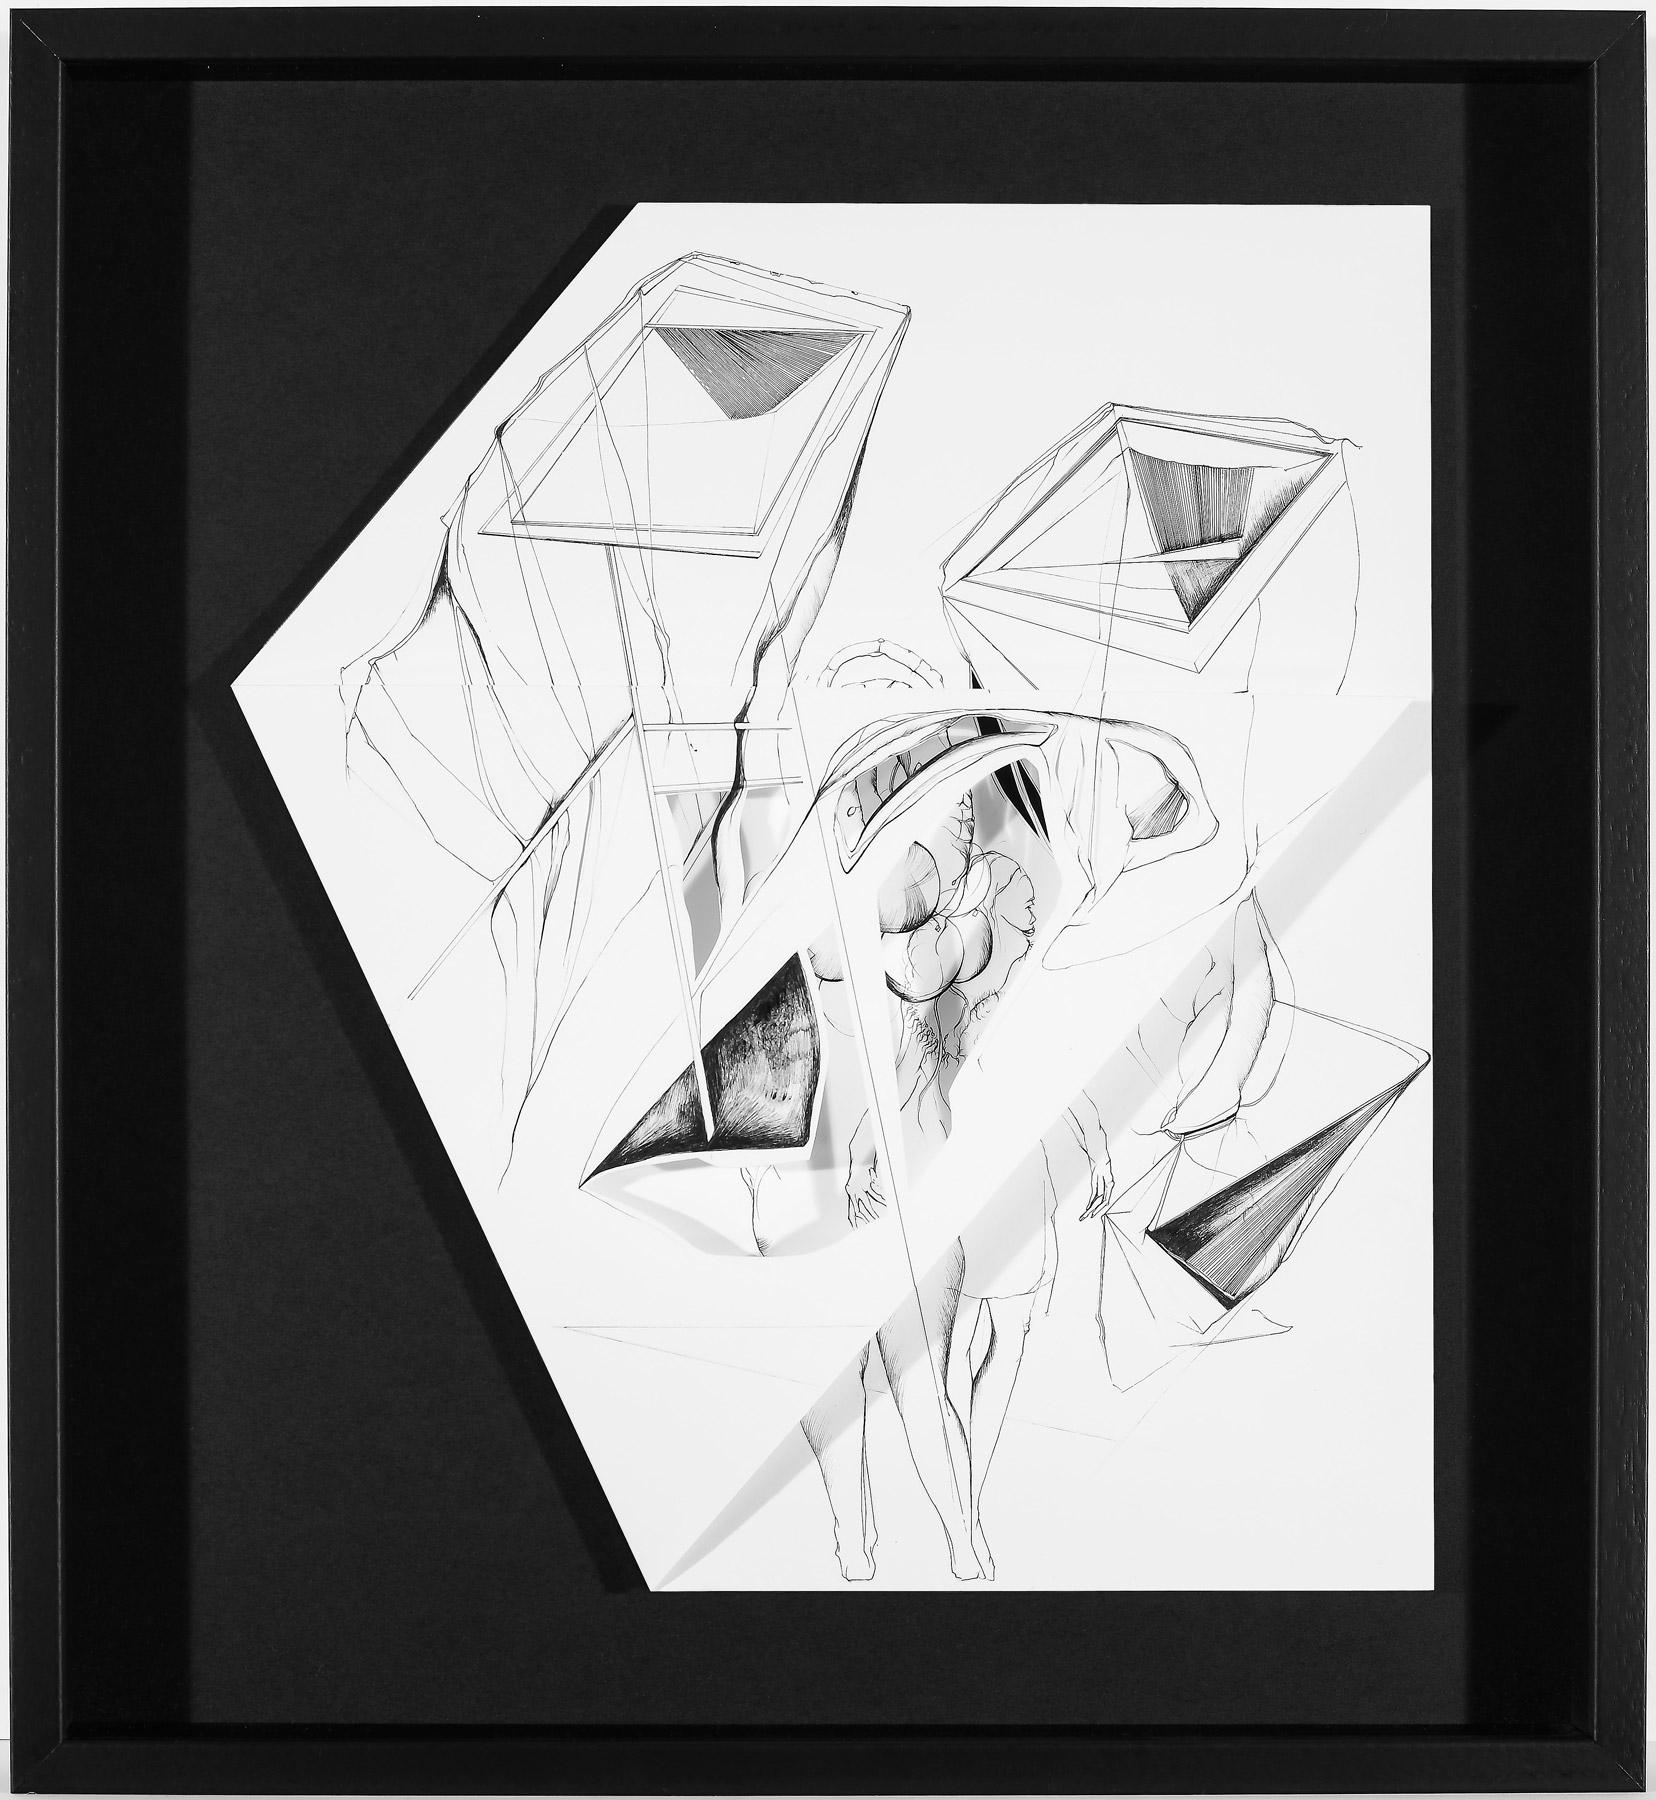 Nina Annabelle Märkl | Hidden Tracks II | Ink on folded paper cut outs | 36 x 33 cm | 2015